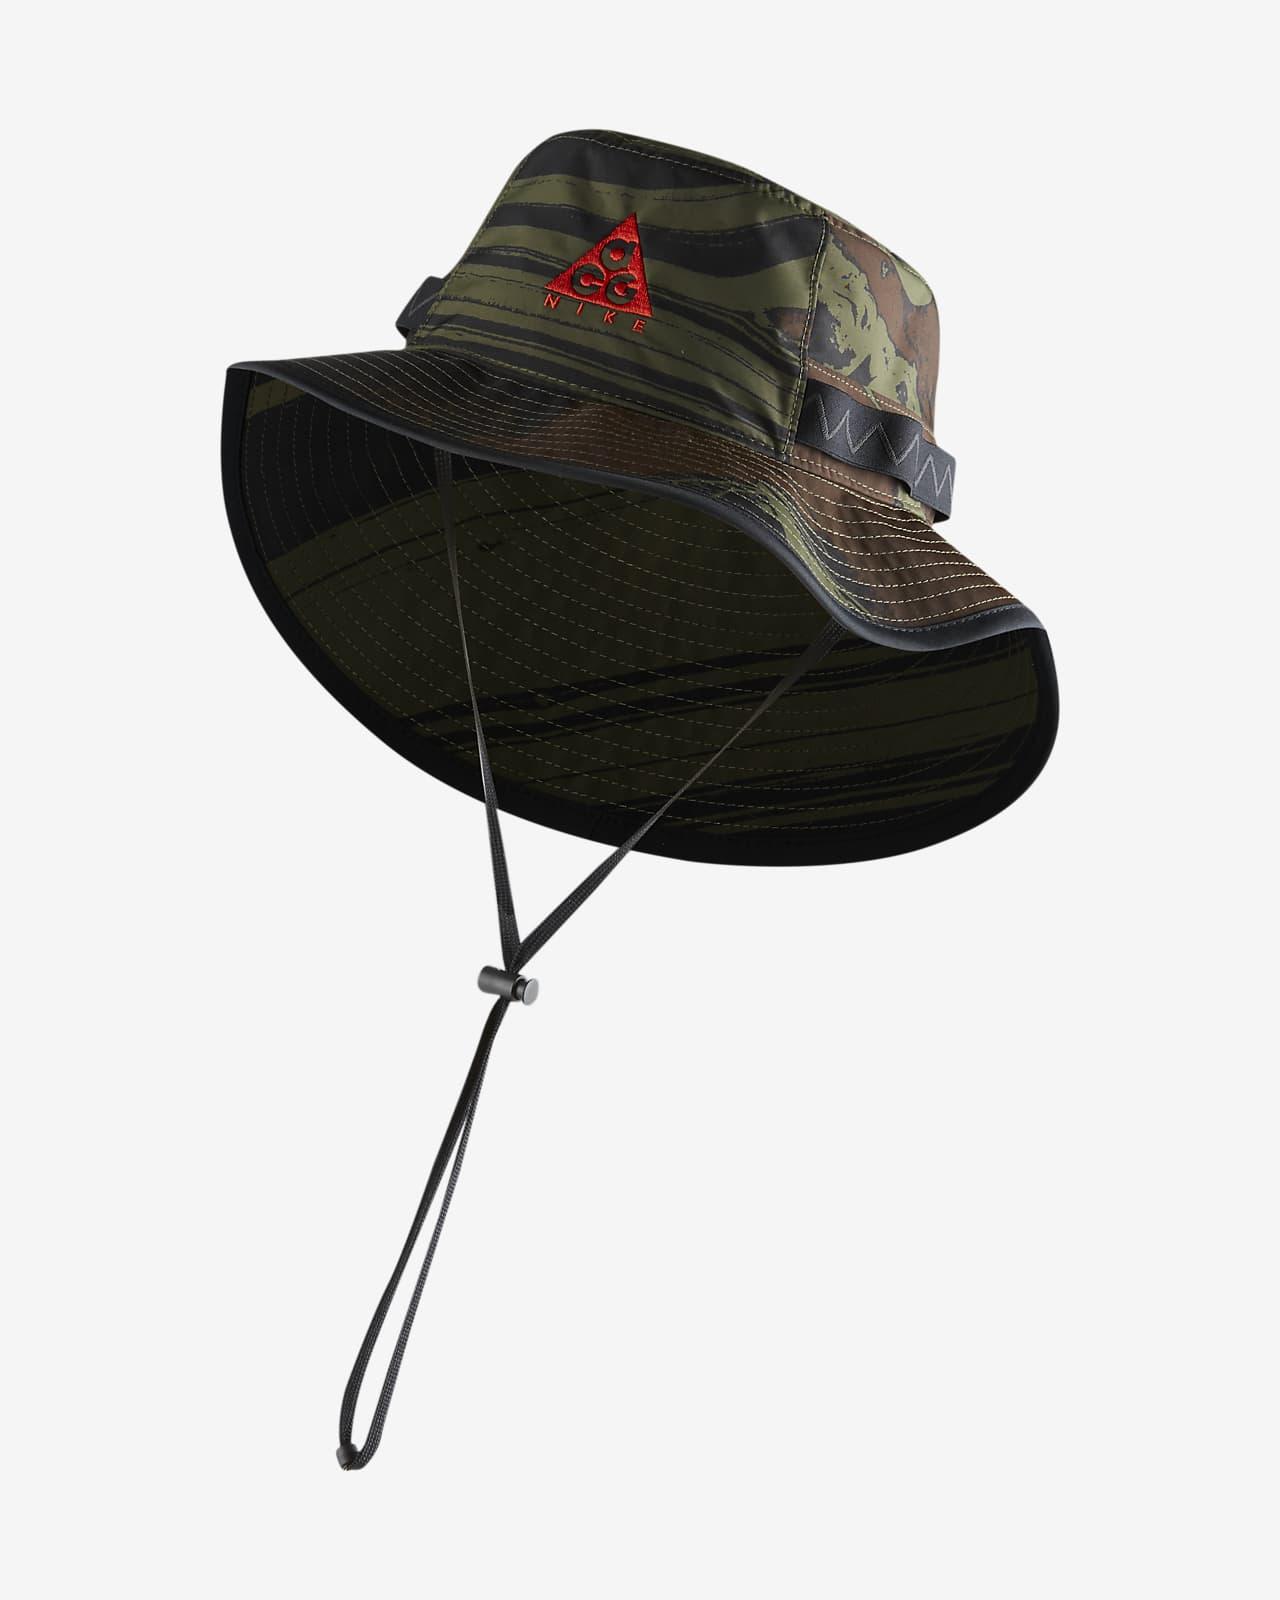 Nike ACG Mt. Fuji Bucket Hat